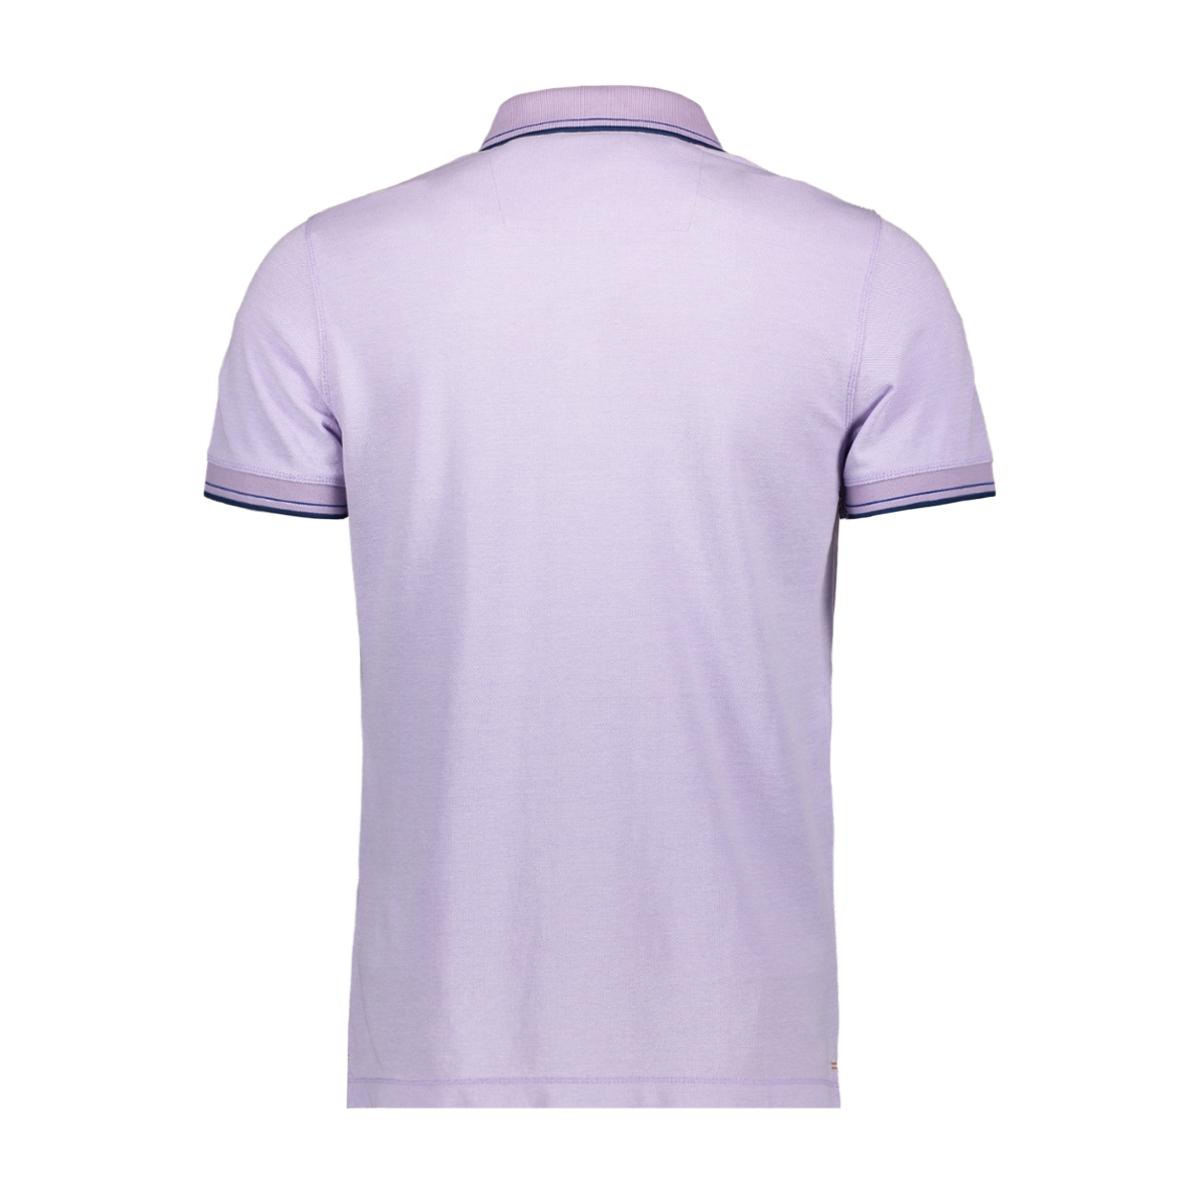 jacquard jersey polo ppss193856 pme legend polo 4243